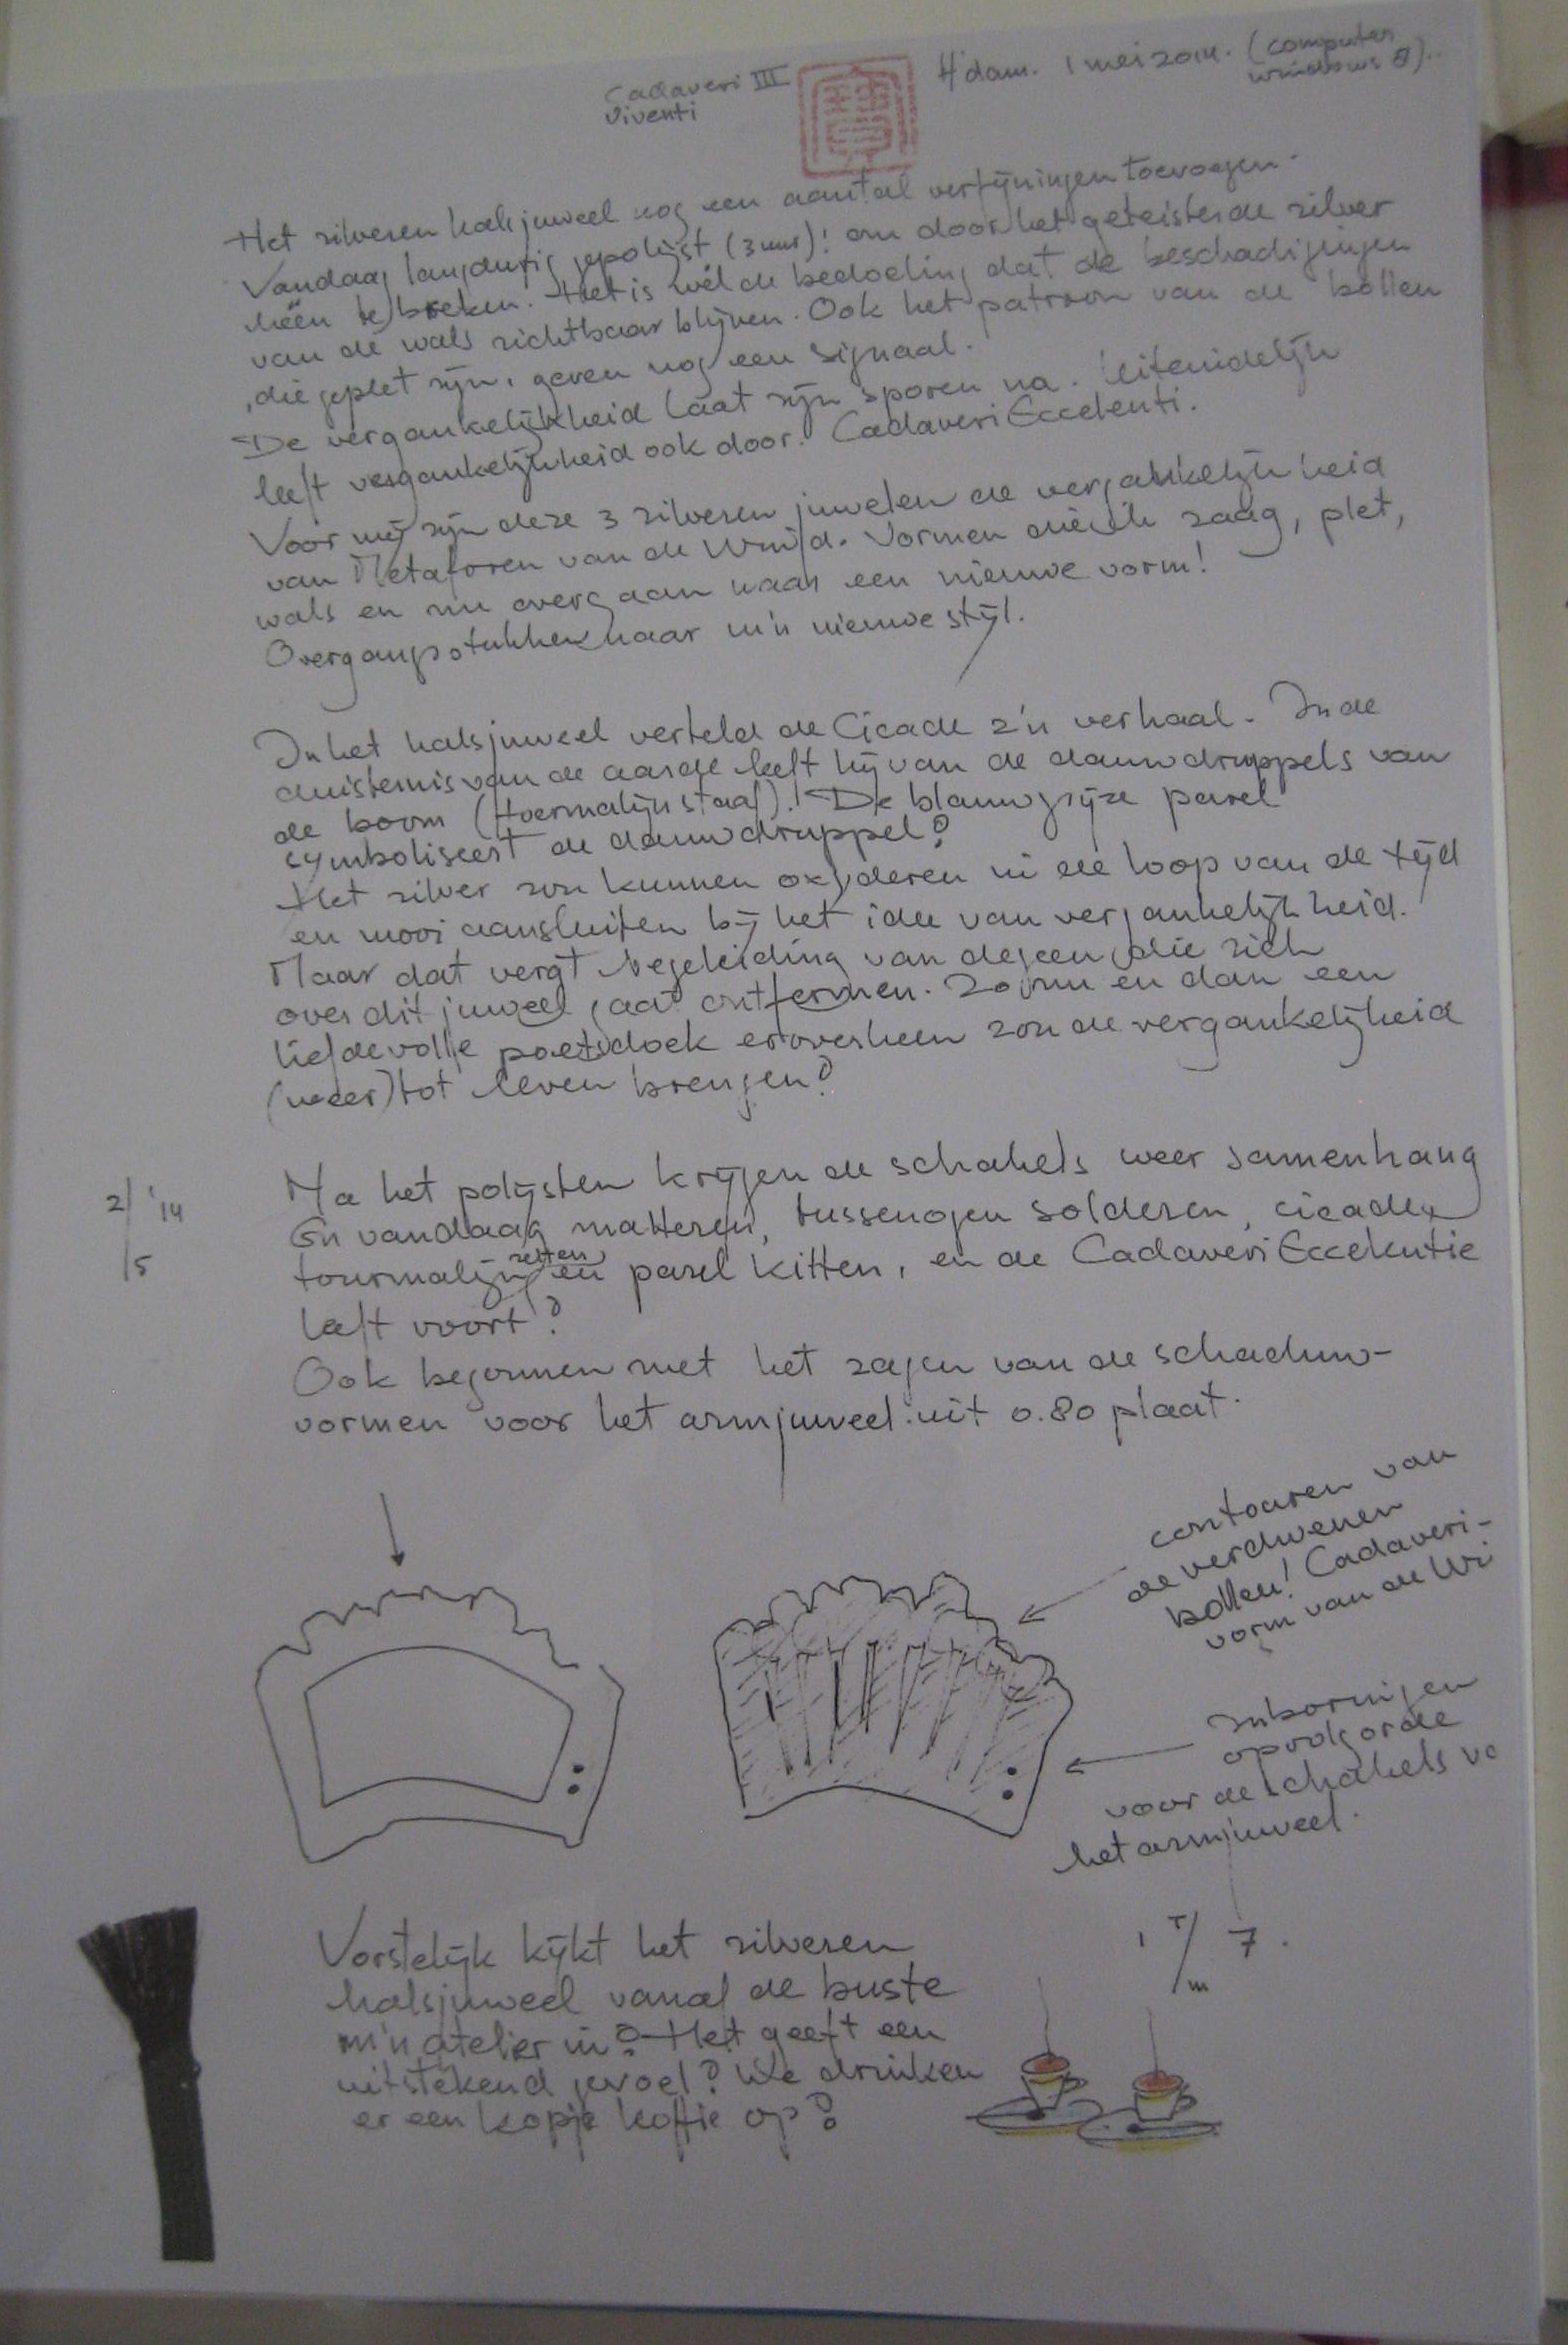 Anneke Schat, tekst en tekeningen, 2014. Foto Esther Doornbusch, CC BY 4.0